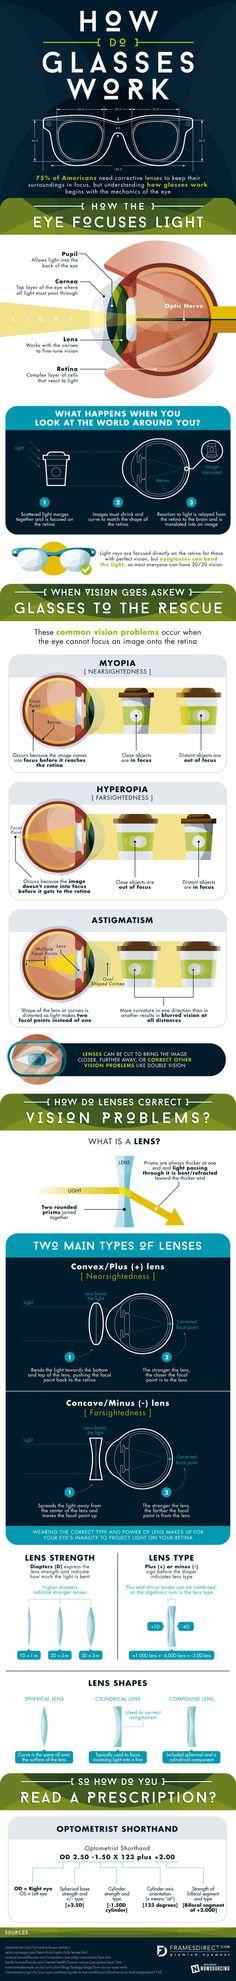 How Do Eyeglasses Work - Industrial Design Infographic